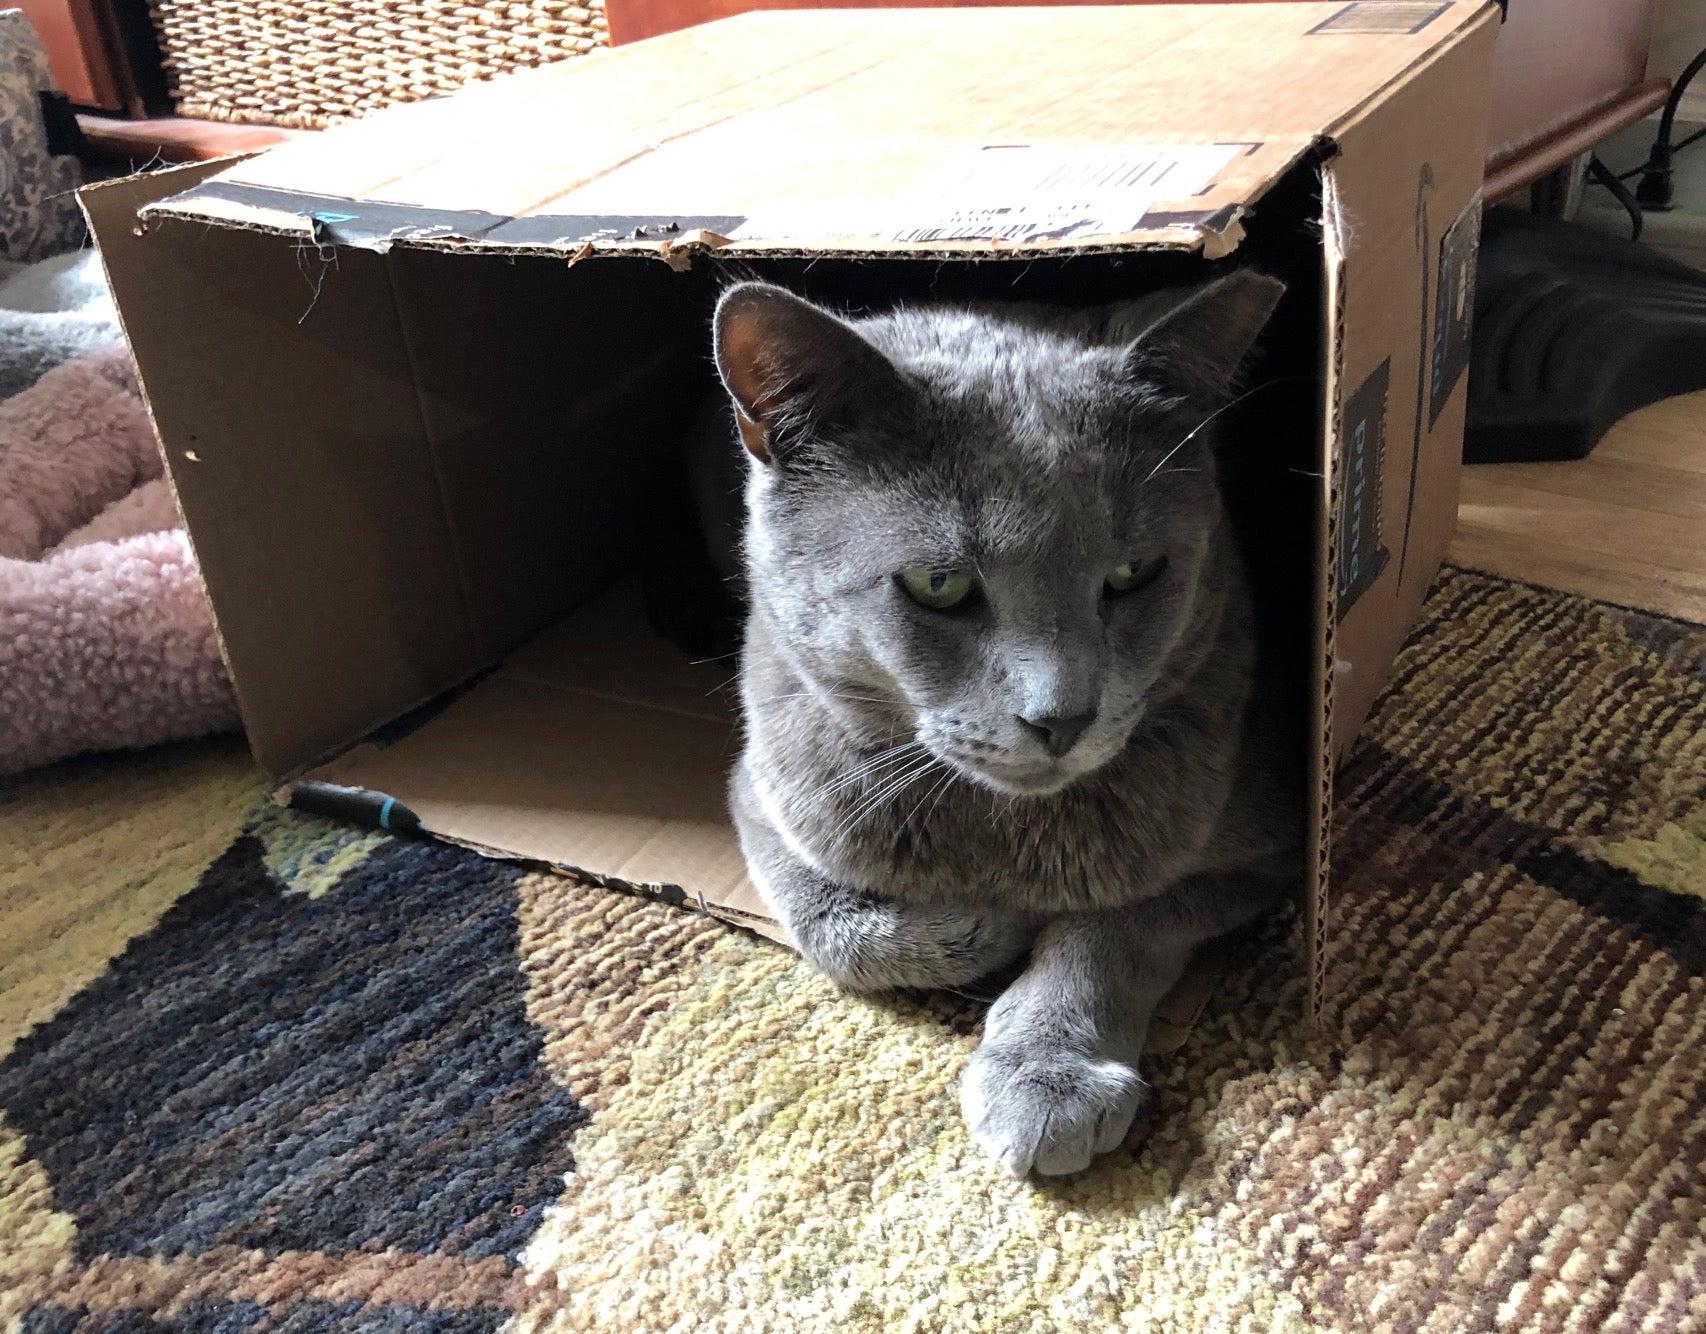 Coronavirus Can Infect Cats